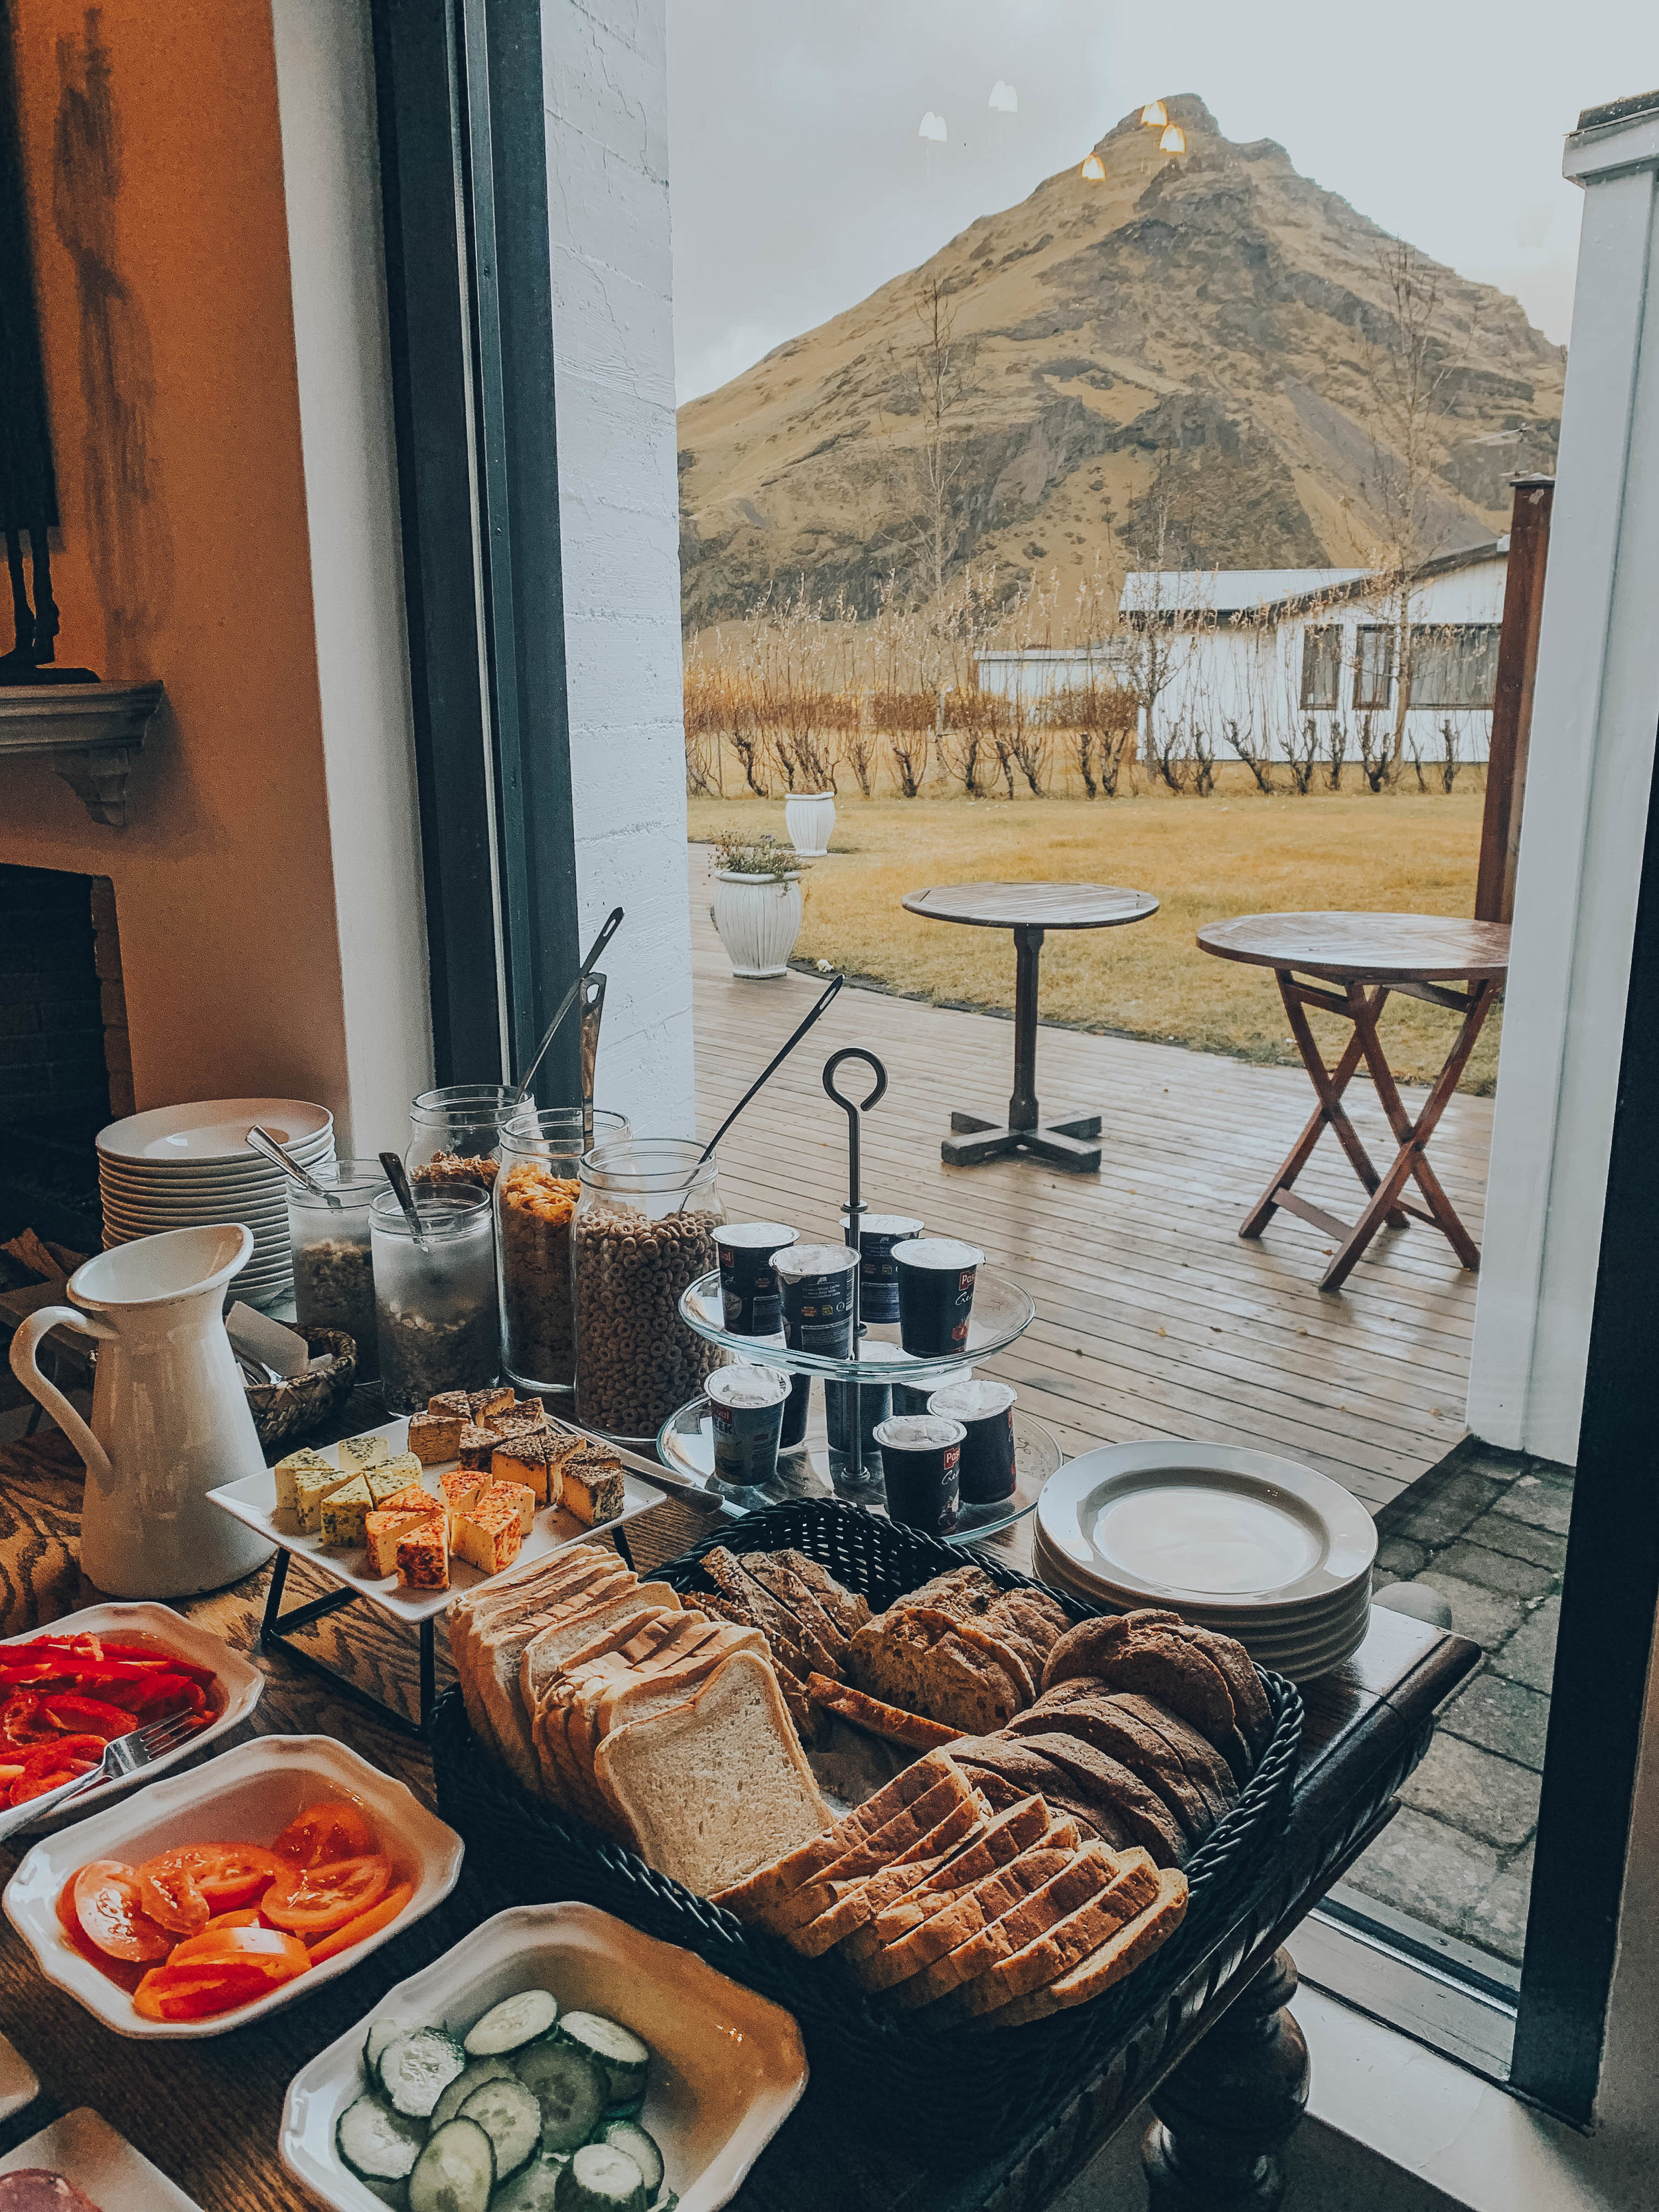 Iceland-Travel-Blog-Ally-Chen7.jpg